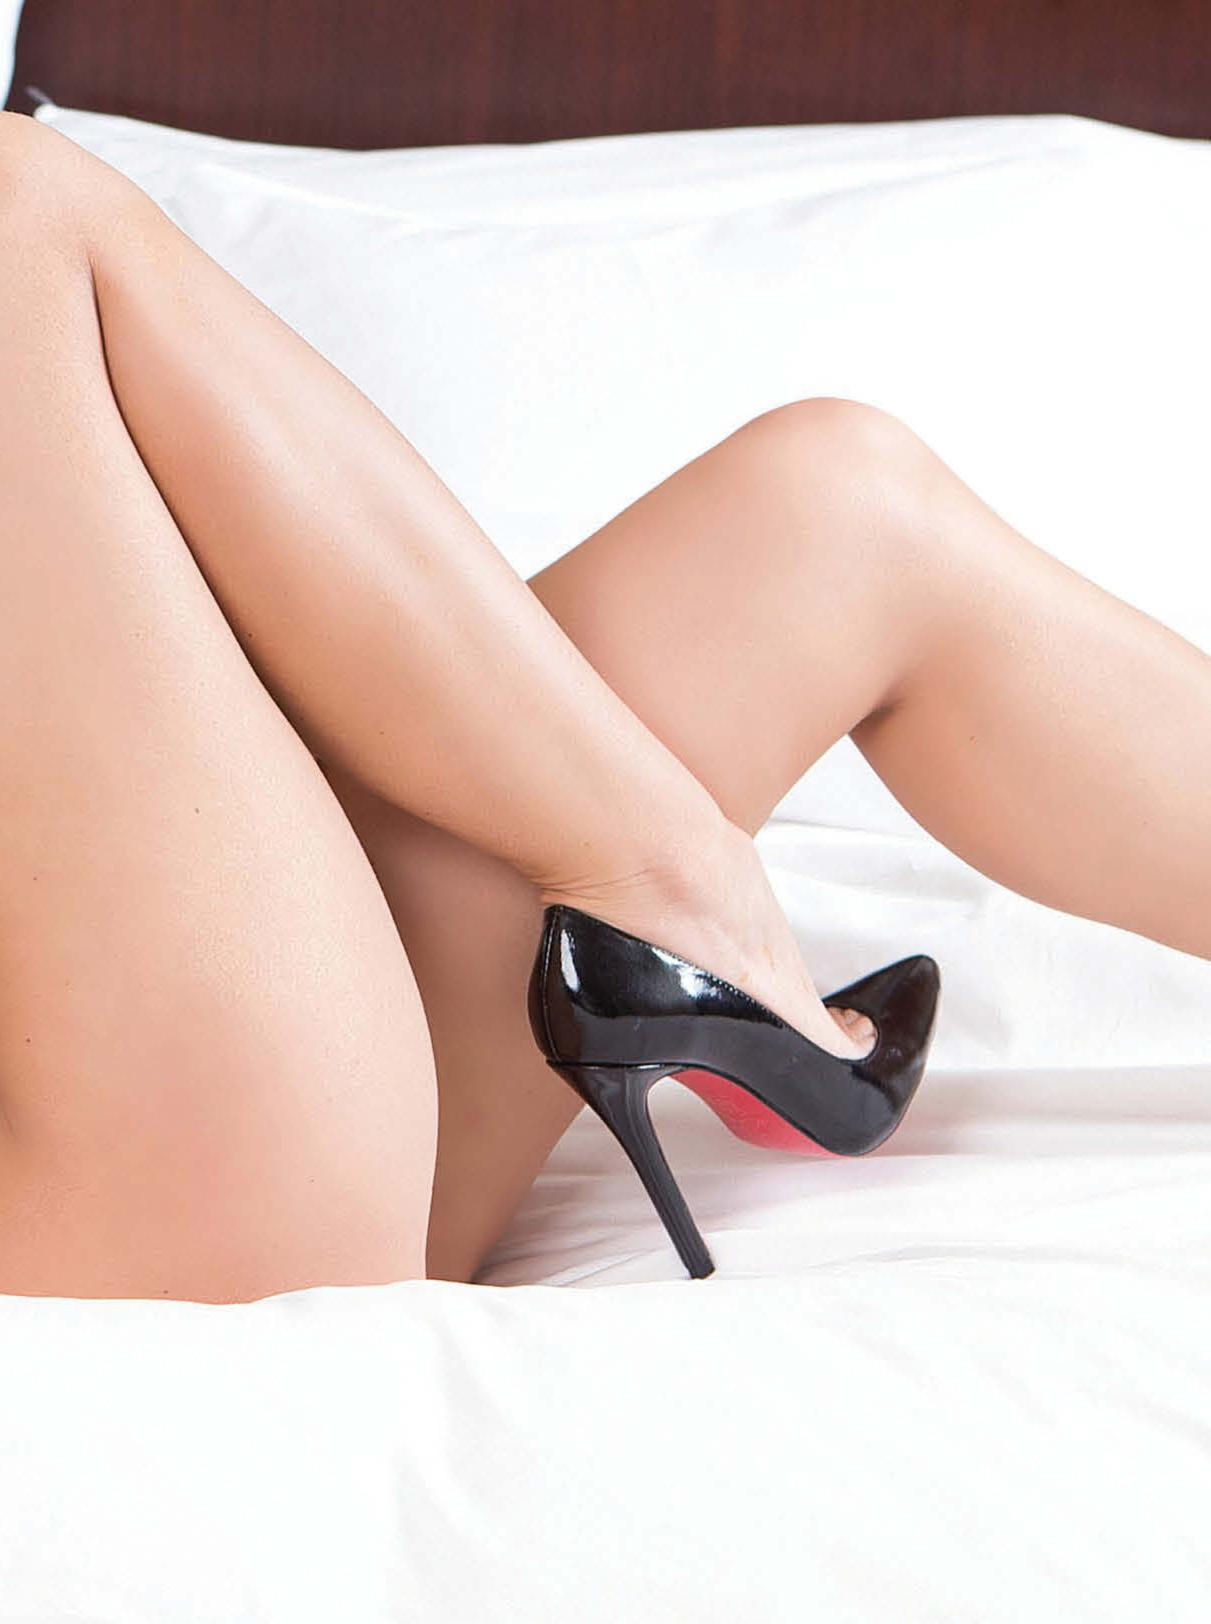 Kaska Kaminski On The Cover Of Playboy Magazine Nsfw  Bootymotiontv-2427